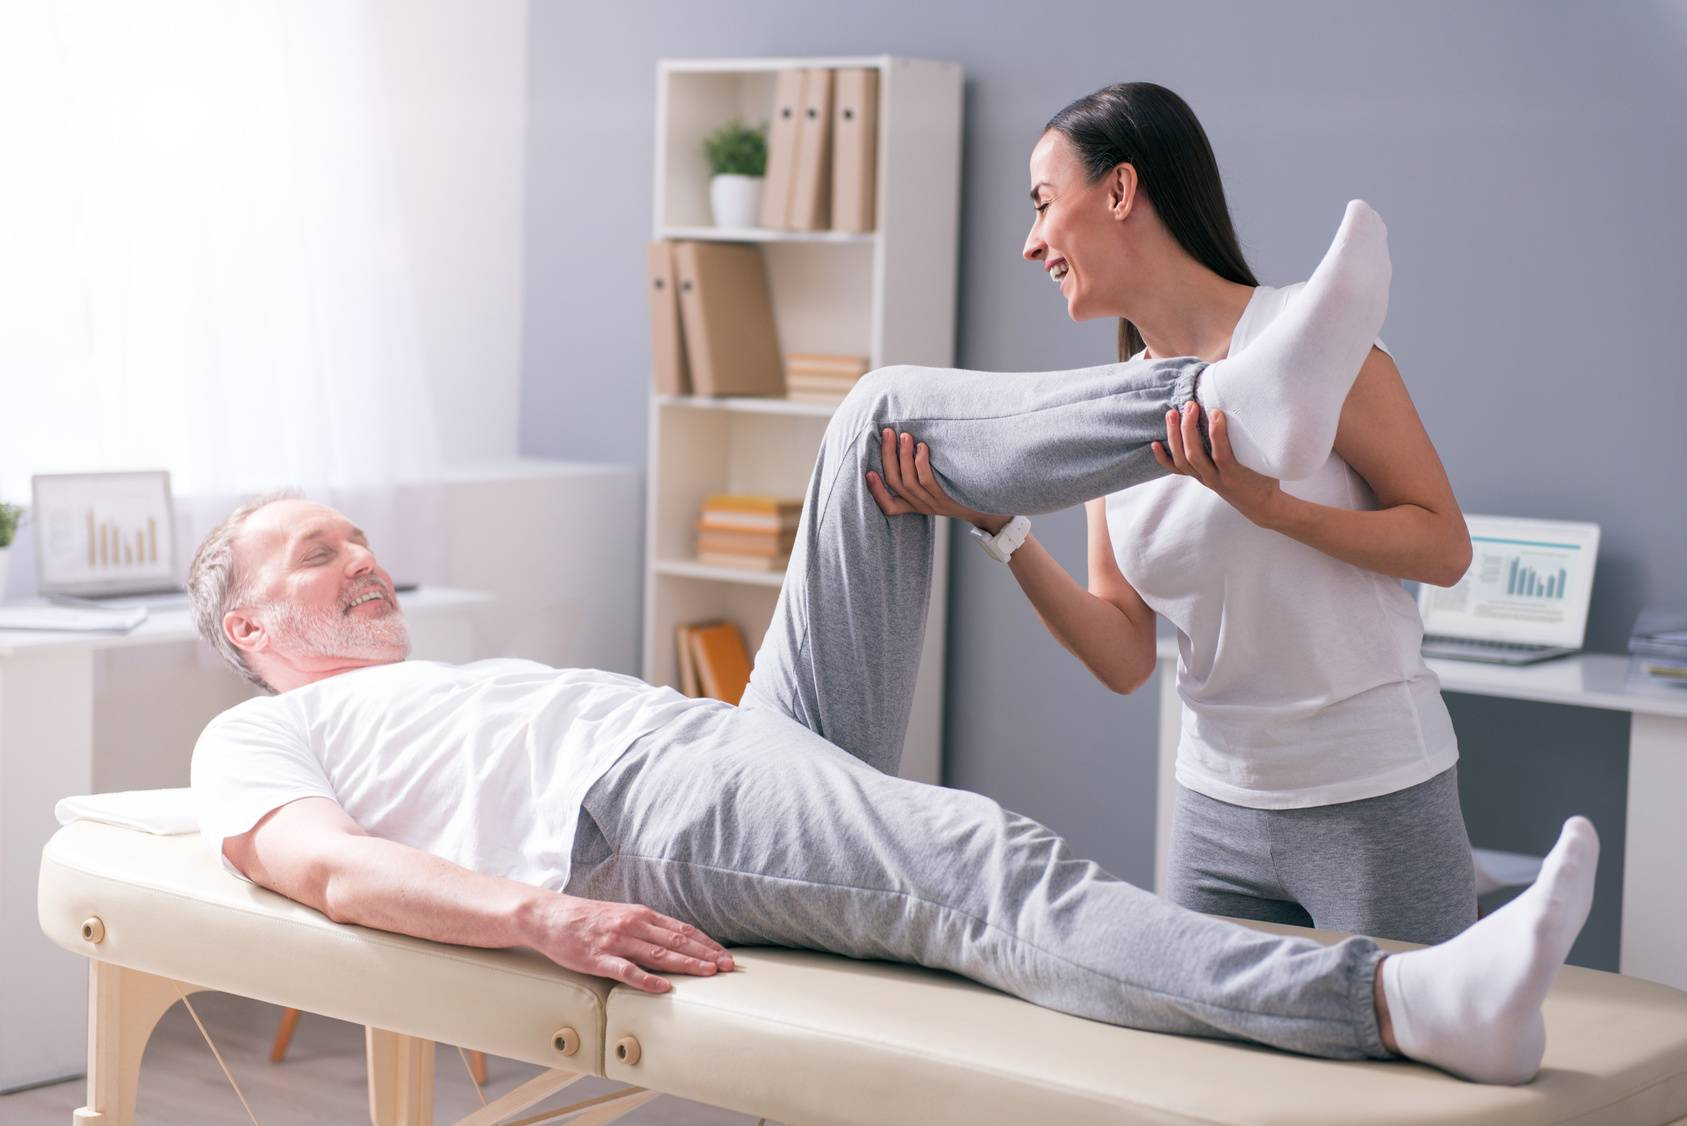 trattamenti fisioterapici, terapie manuali